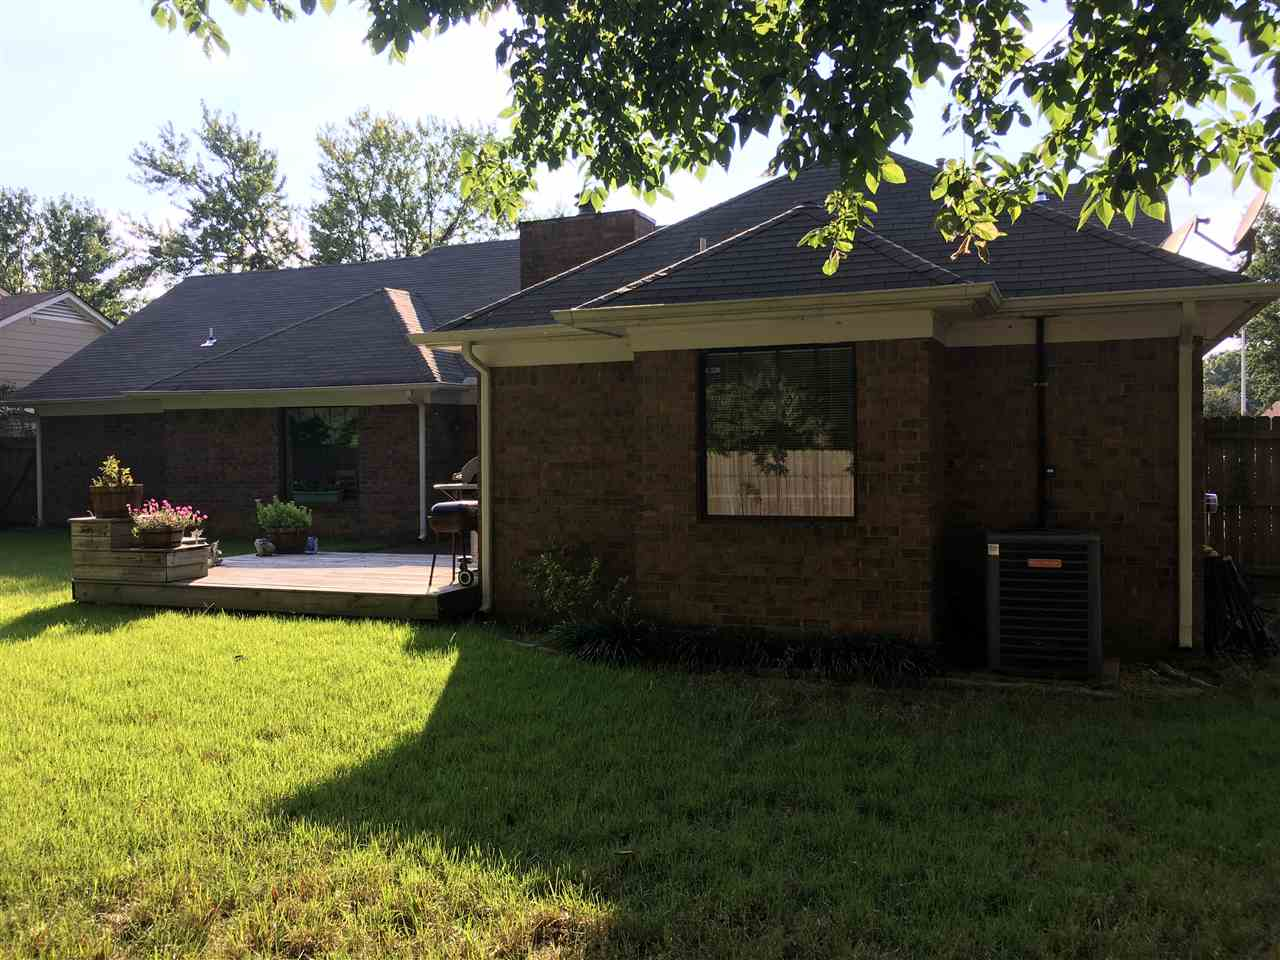 4032 Keynon Memphis, TN 38125 - MLS #: 10008695